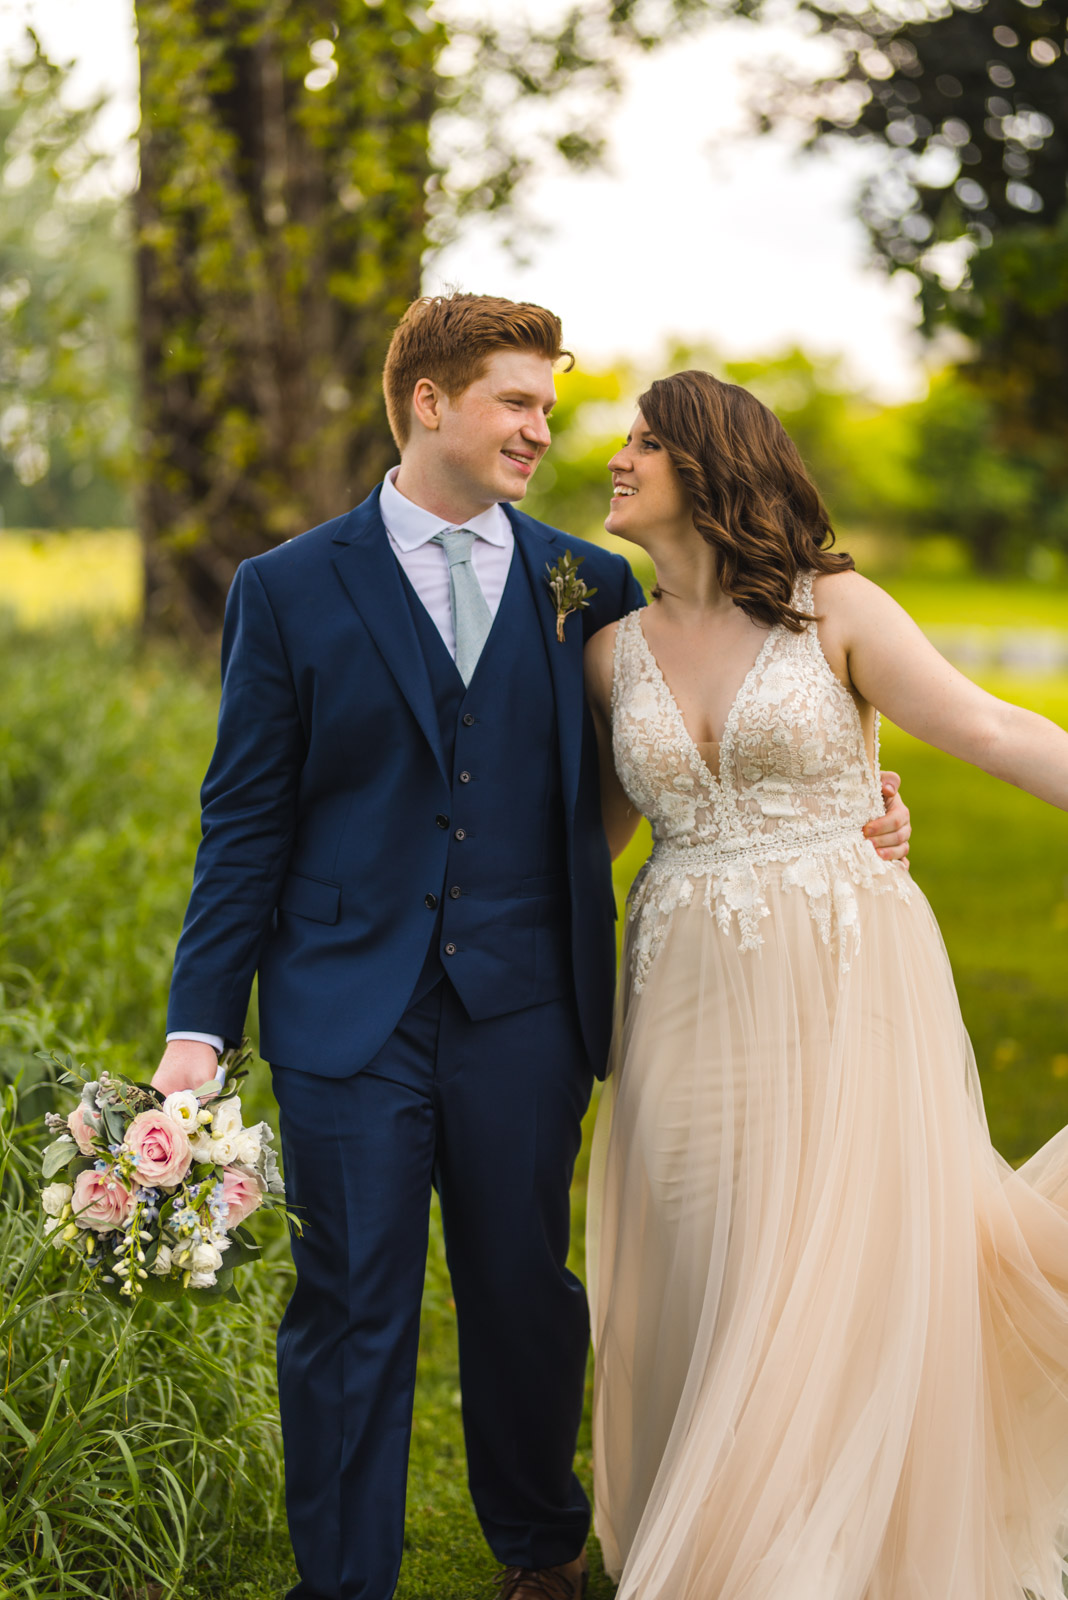 Emerson & Elicia's Golf Course Wedding Aidan & Leanne Hennebry Hamilton Wedding Videographers Photographers Niagara Hush Hush Photography & Film-49.jpg